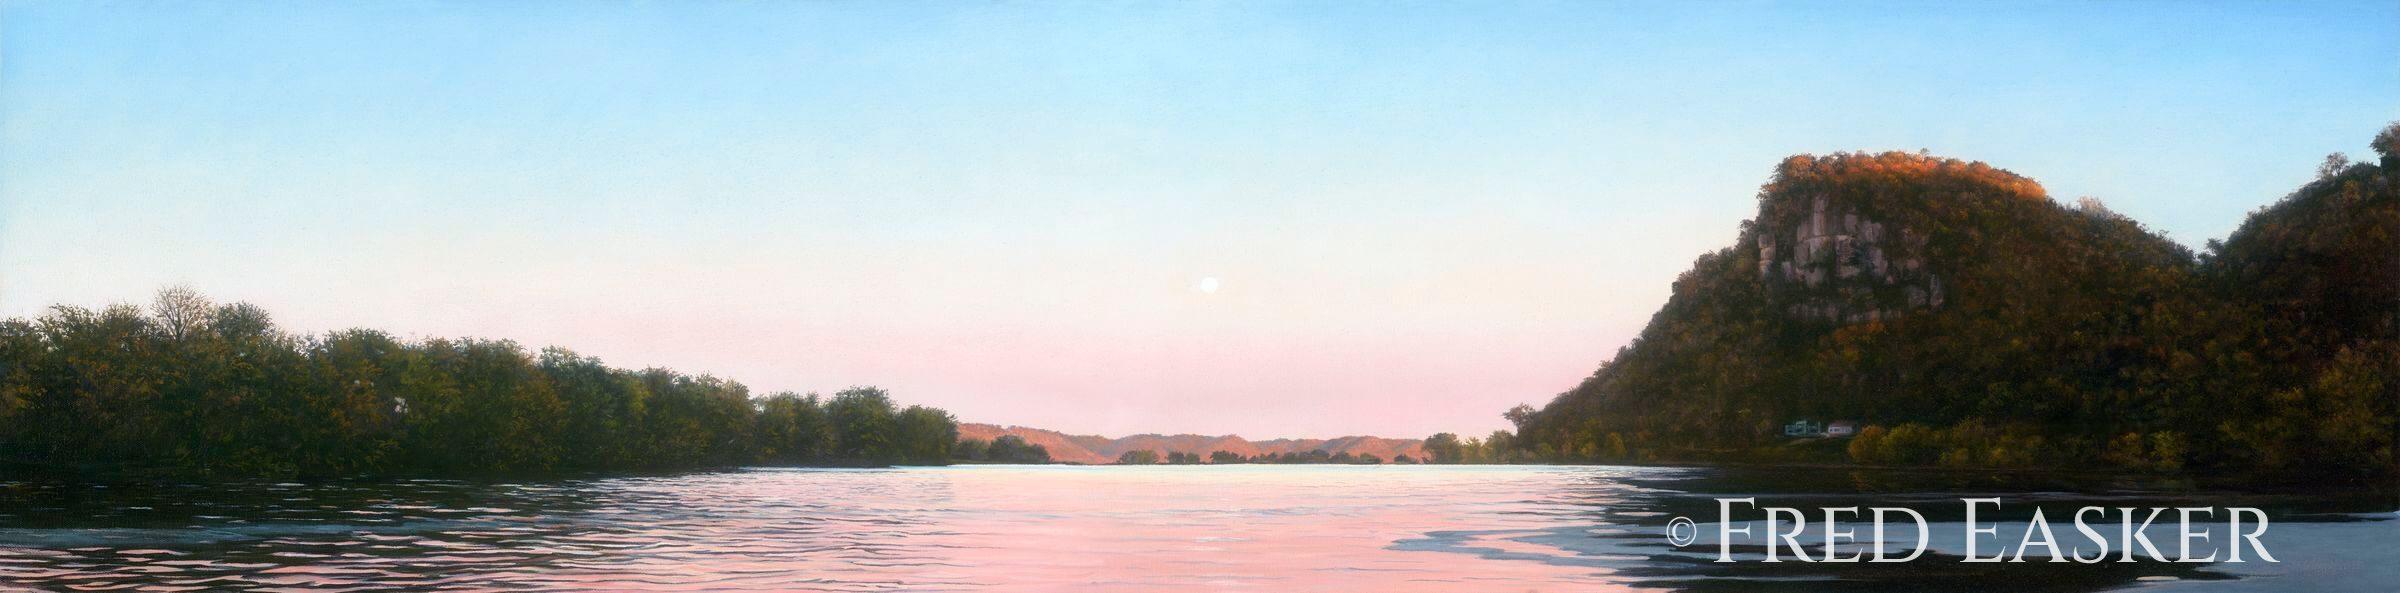 Lansing Twilight by Fred Easker